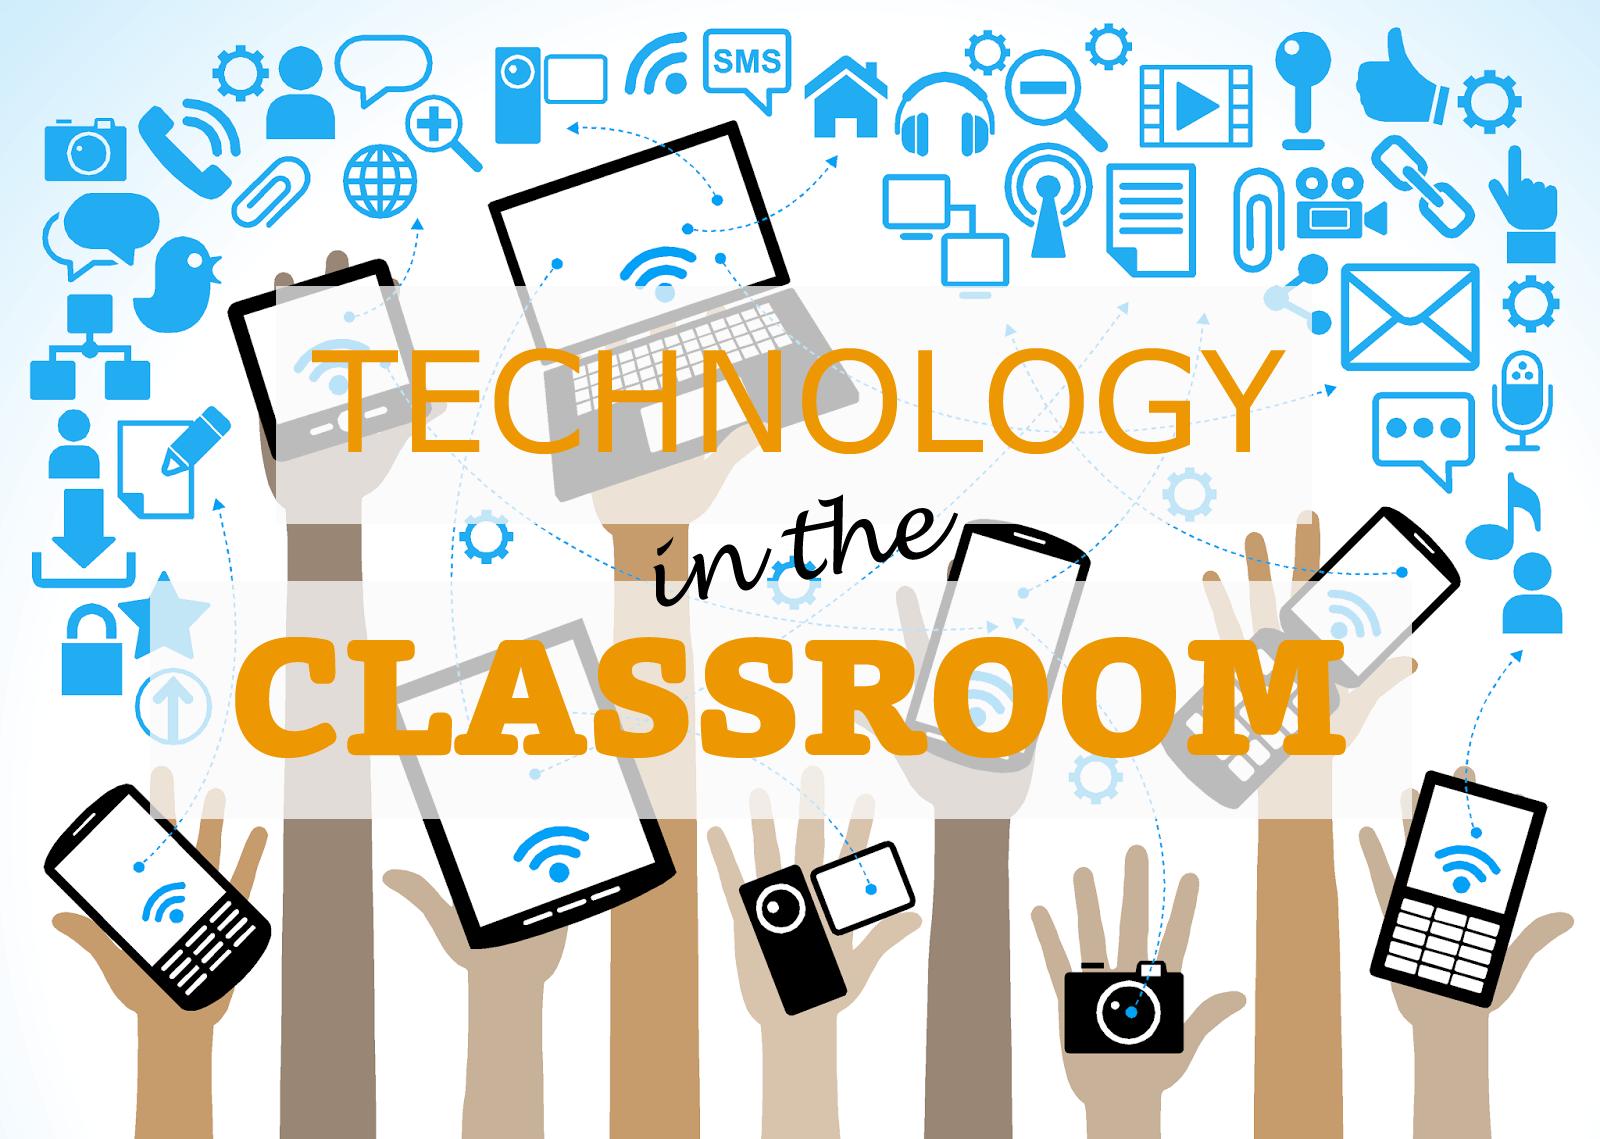 Fun Classroom Activities Using Technology